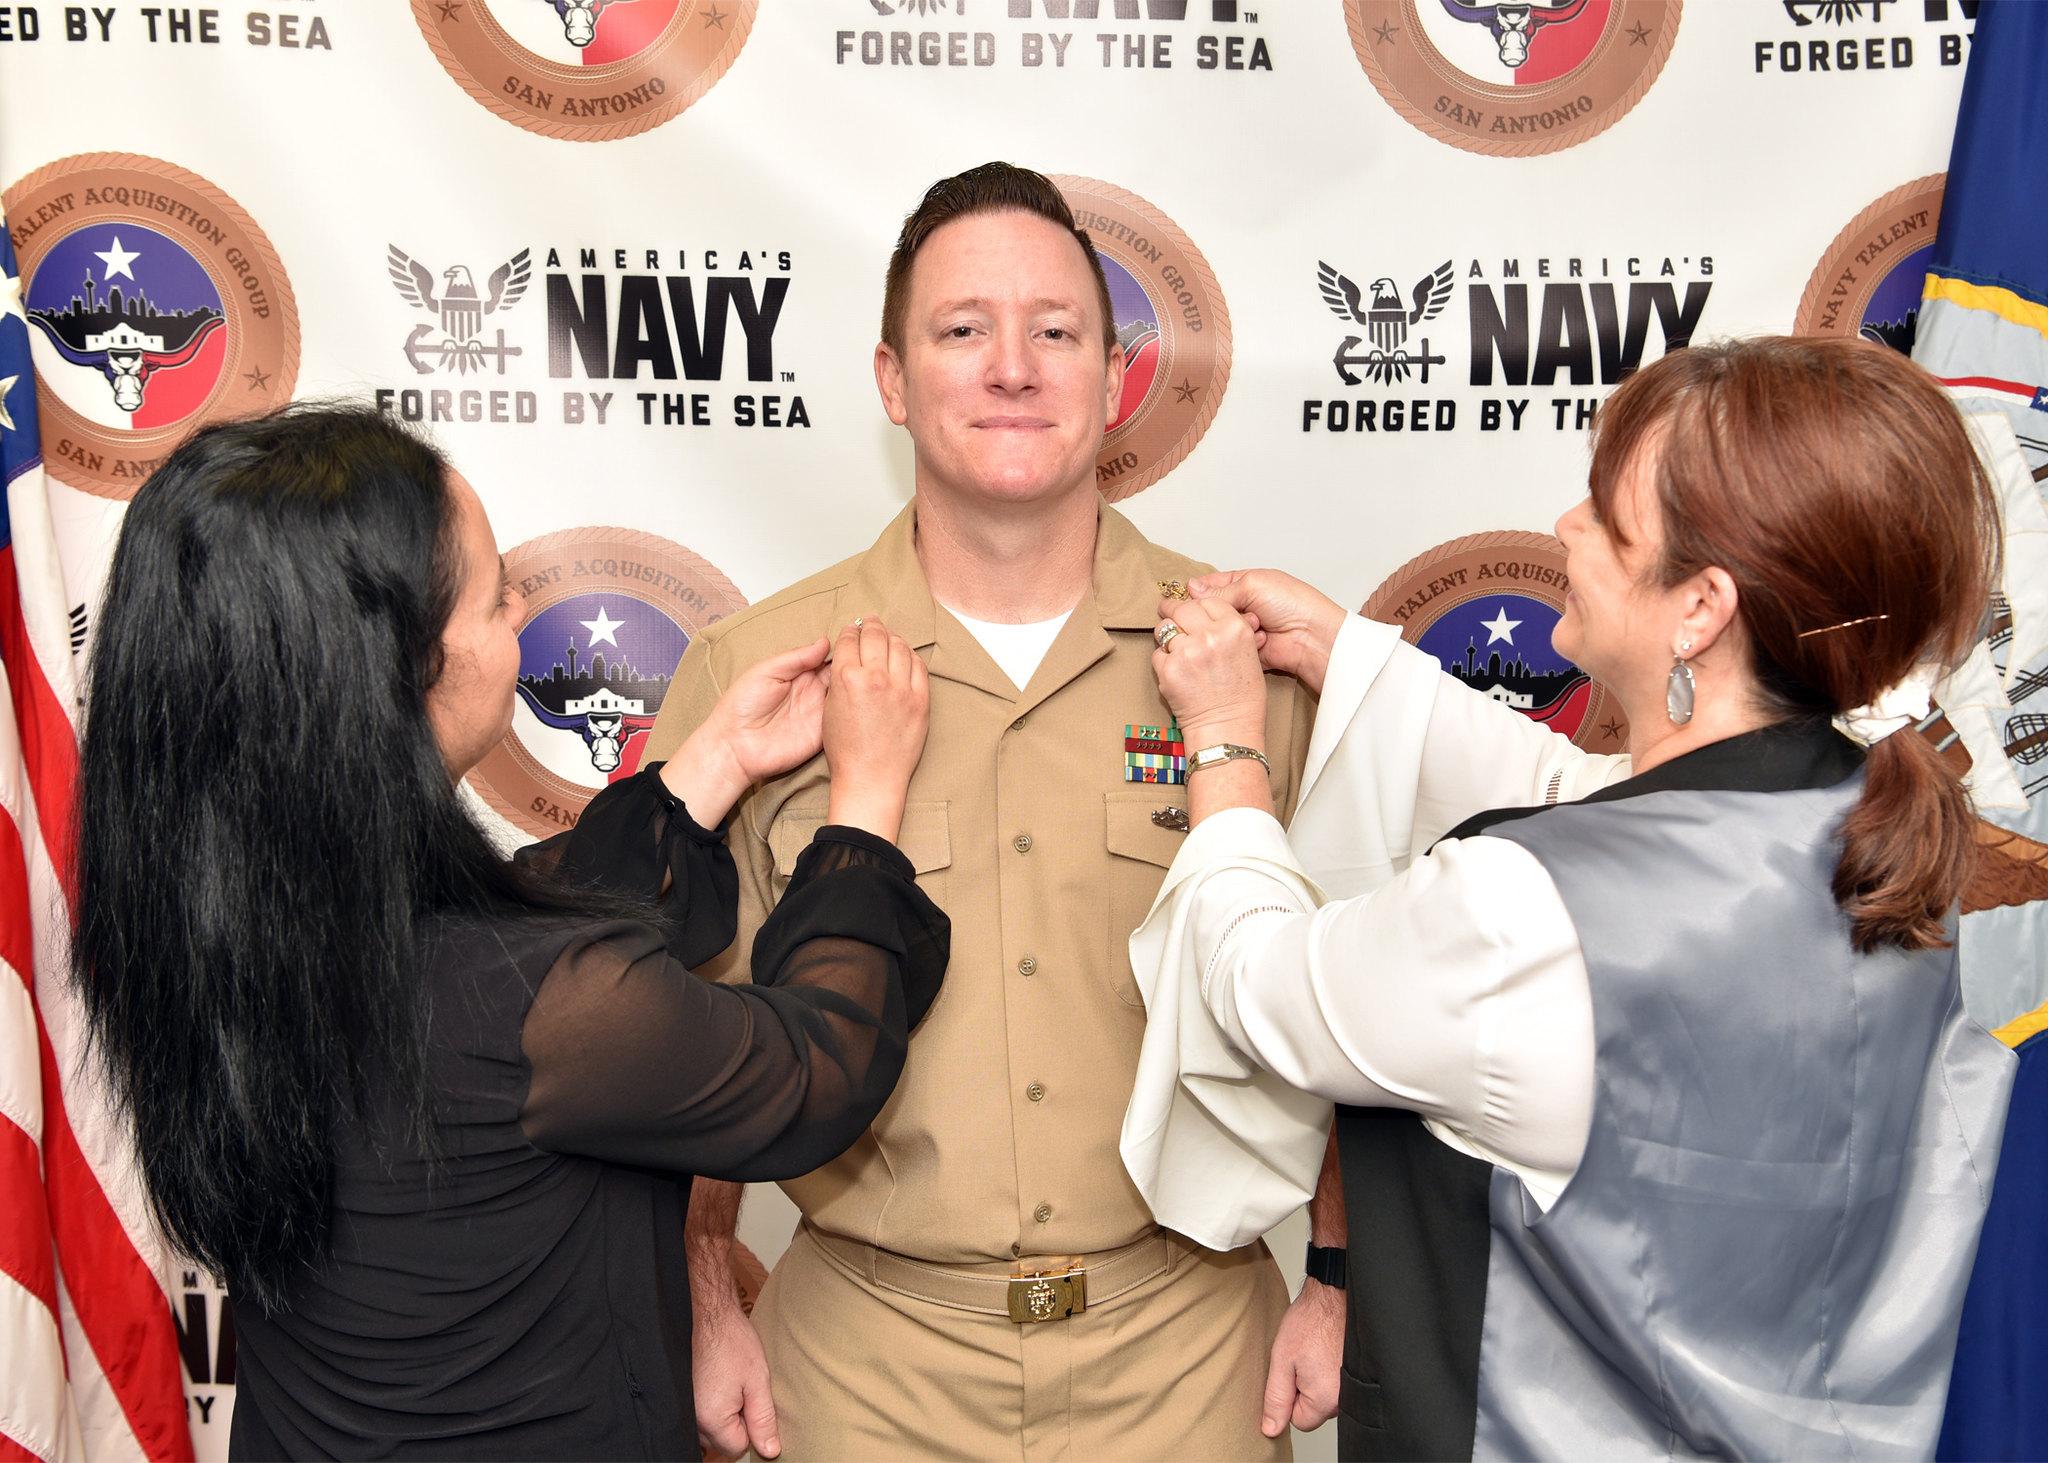 U.S. Navy Photo by Burrell Parmer, NTAG San Antonio Public Affairs/Released